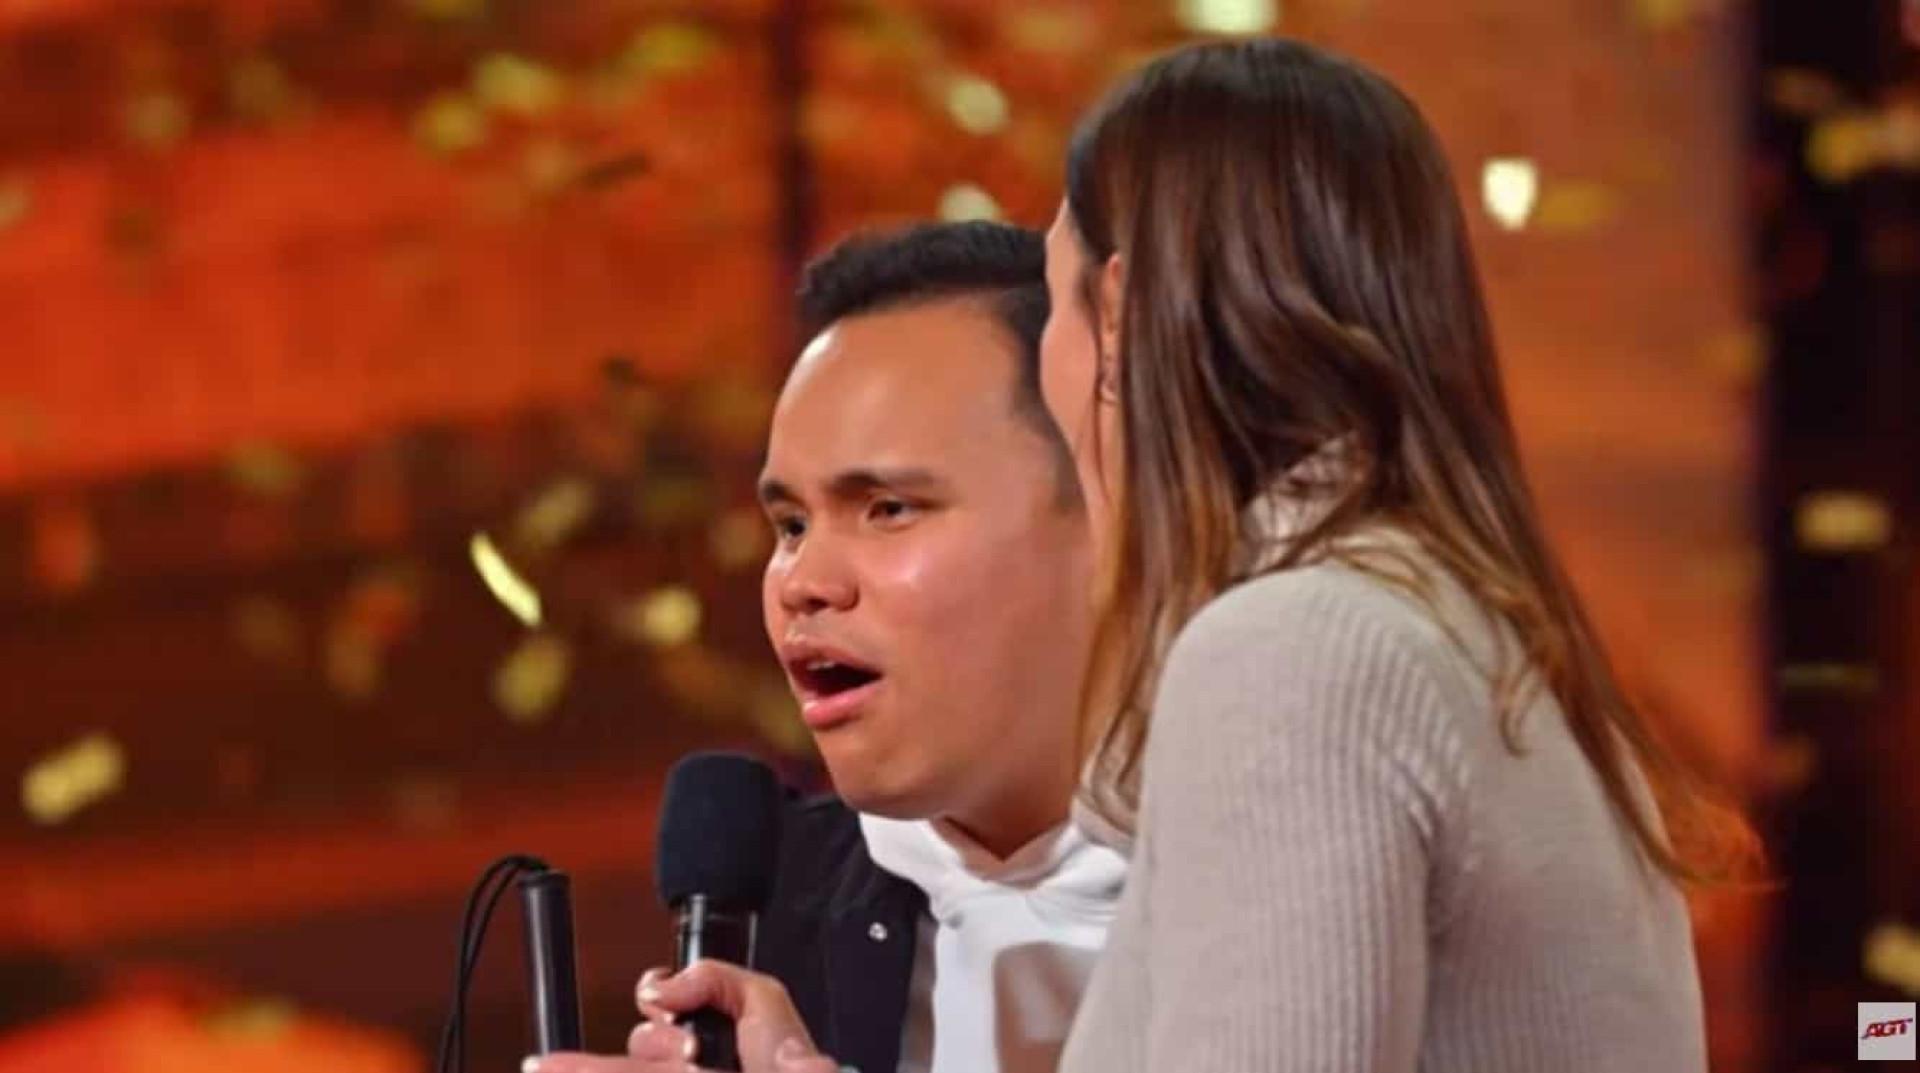 Austista e cego, Kodi venceu 'America's Got Talent' em final emotiva